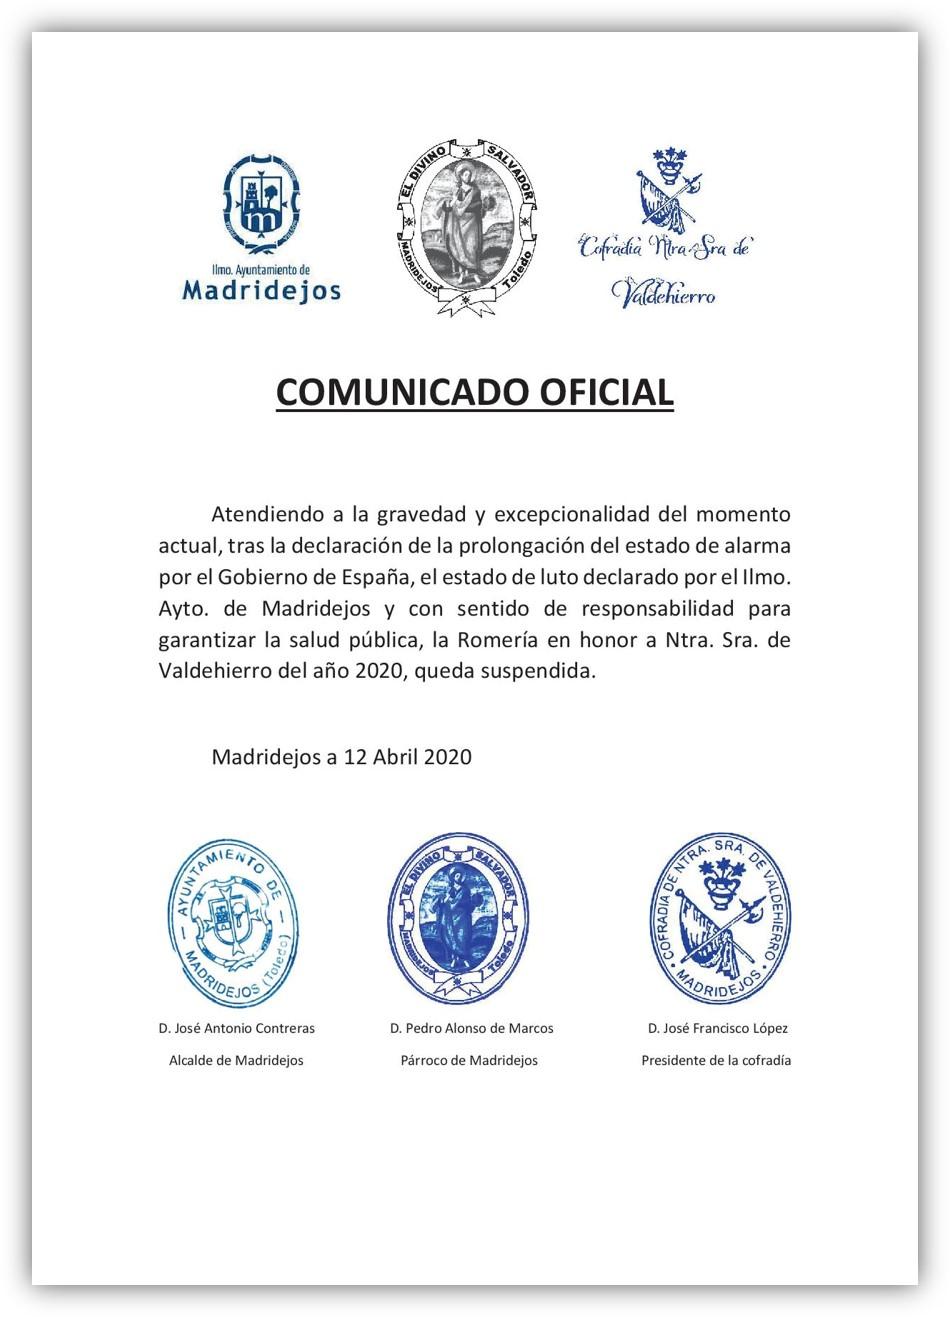 suspension romeria ntra. sra. valdehierro madridejos